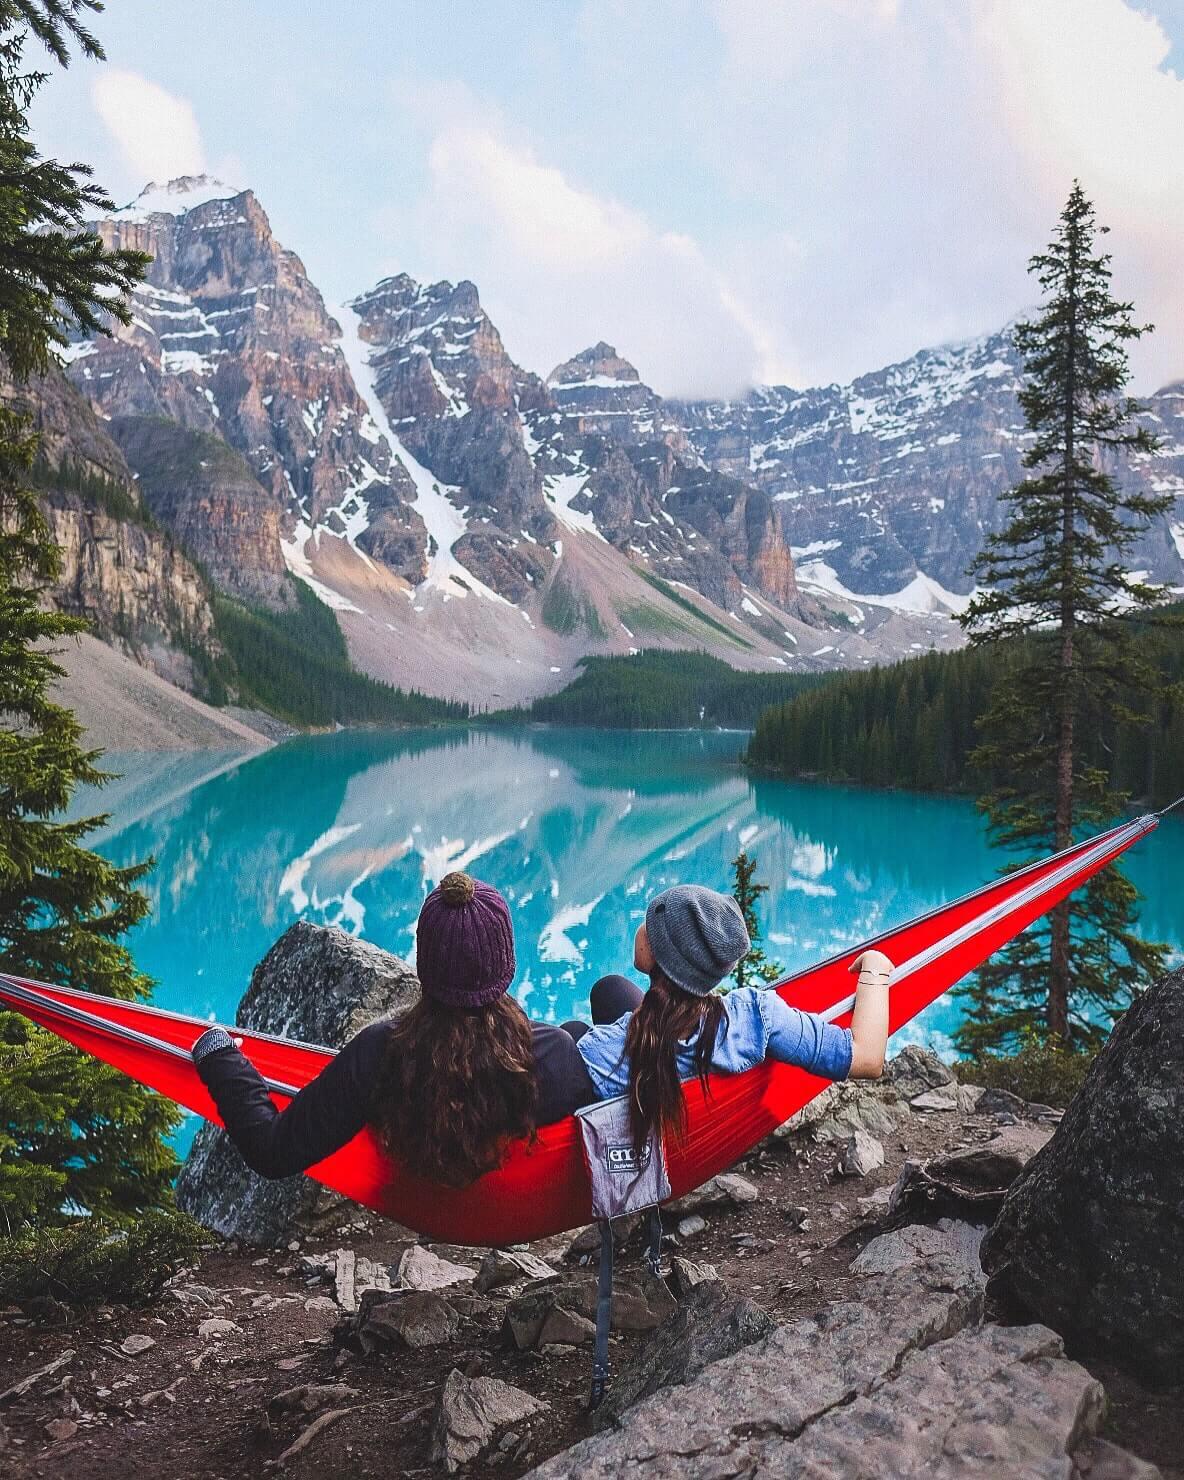 Hammock on Moraine Lake in Banff National Park